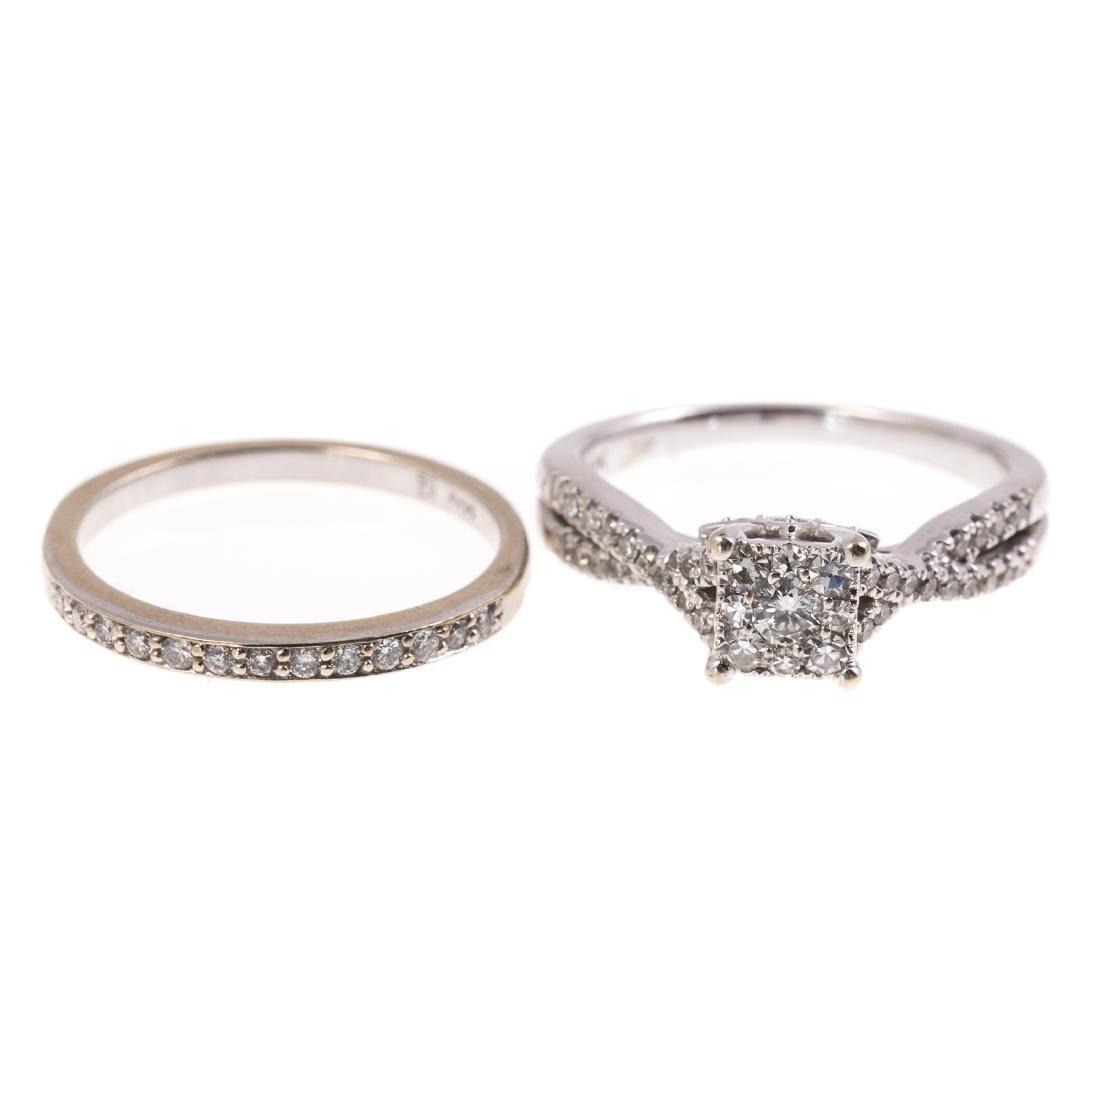 A Ladies Diamond Engagement Ring & Band Set